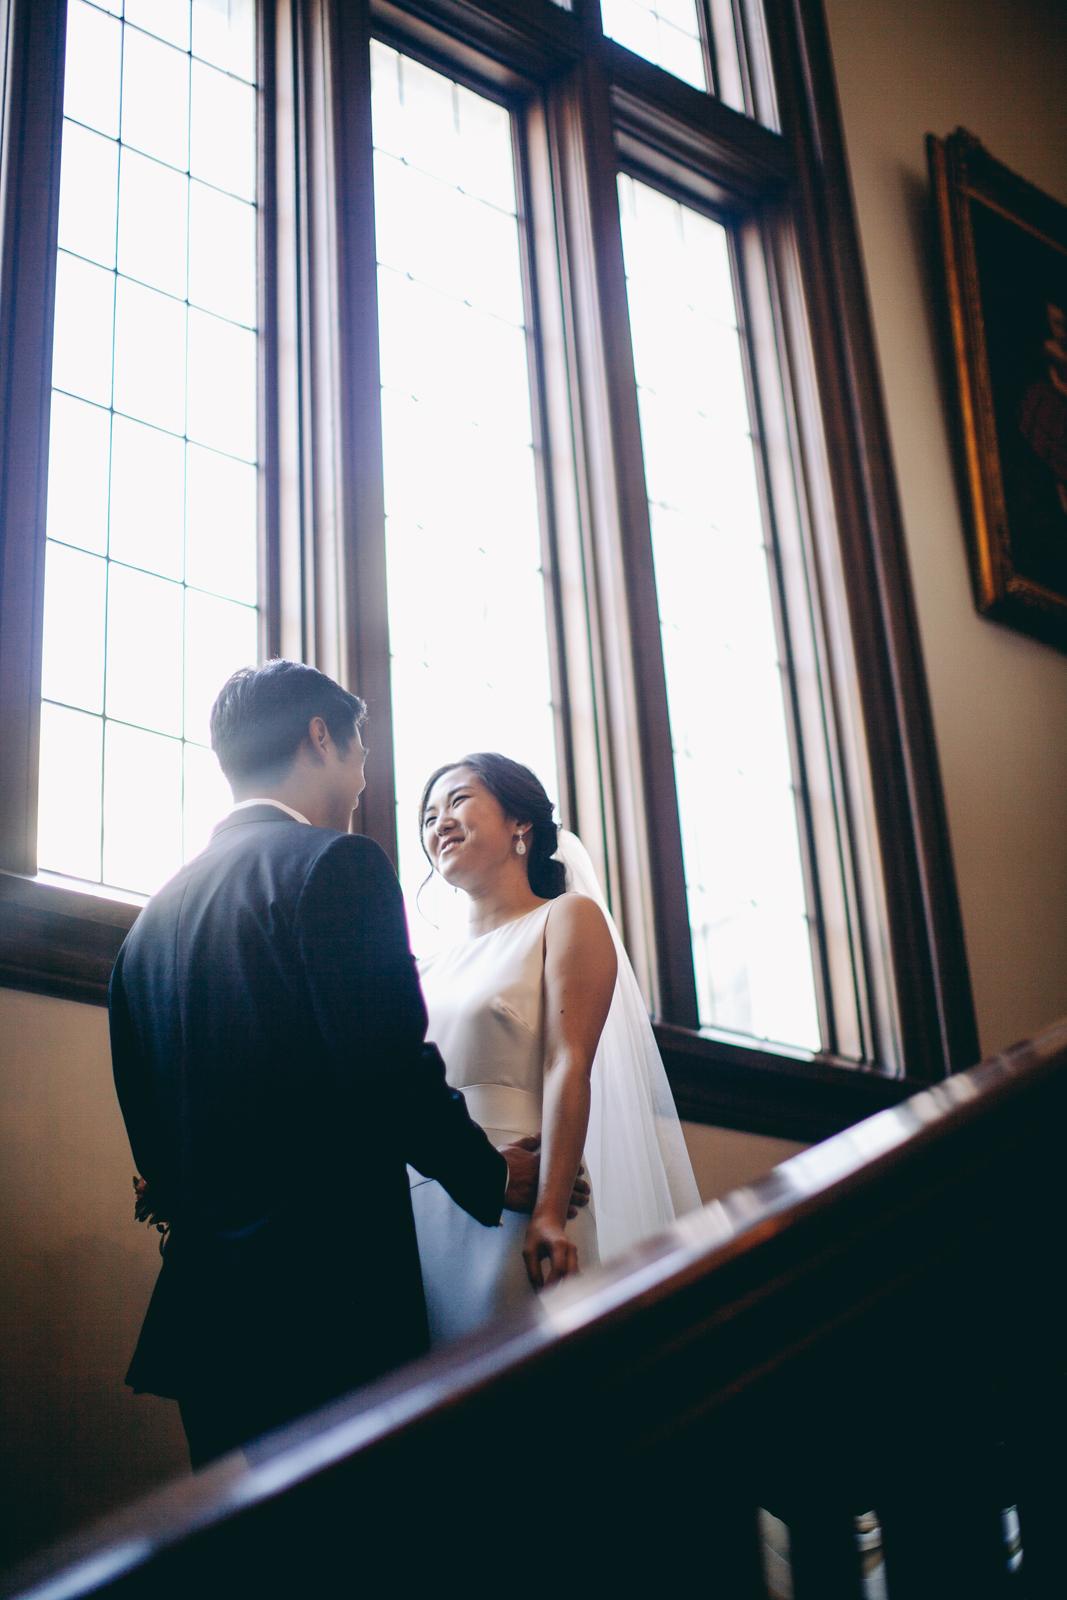 kohl_manison_wedding_photography_sarah_eric_ebony_siovhan_bokeh_photography_020.jpg